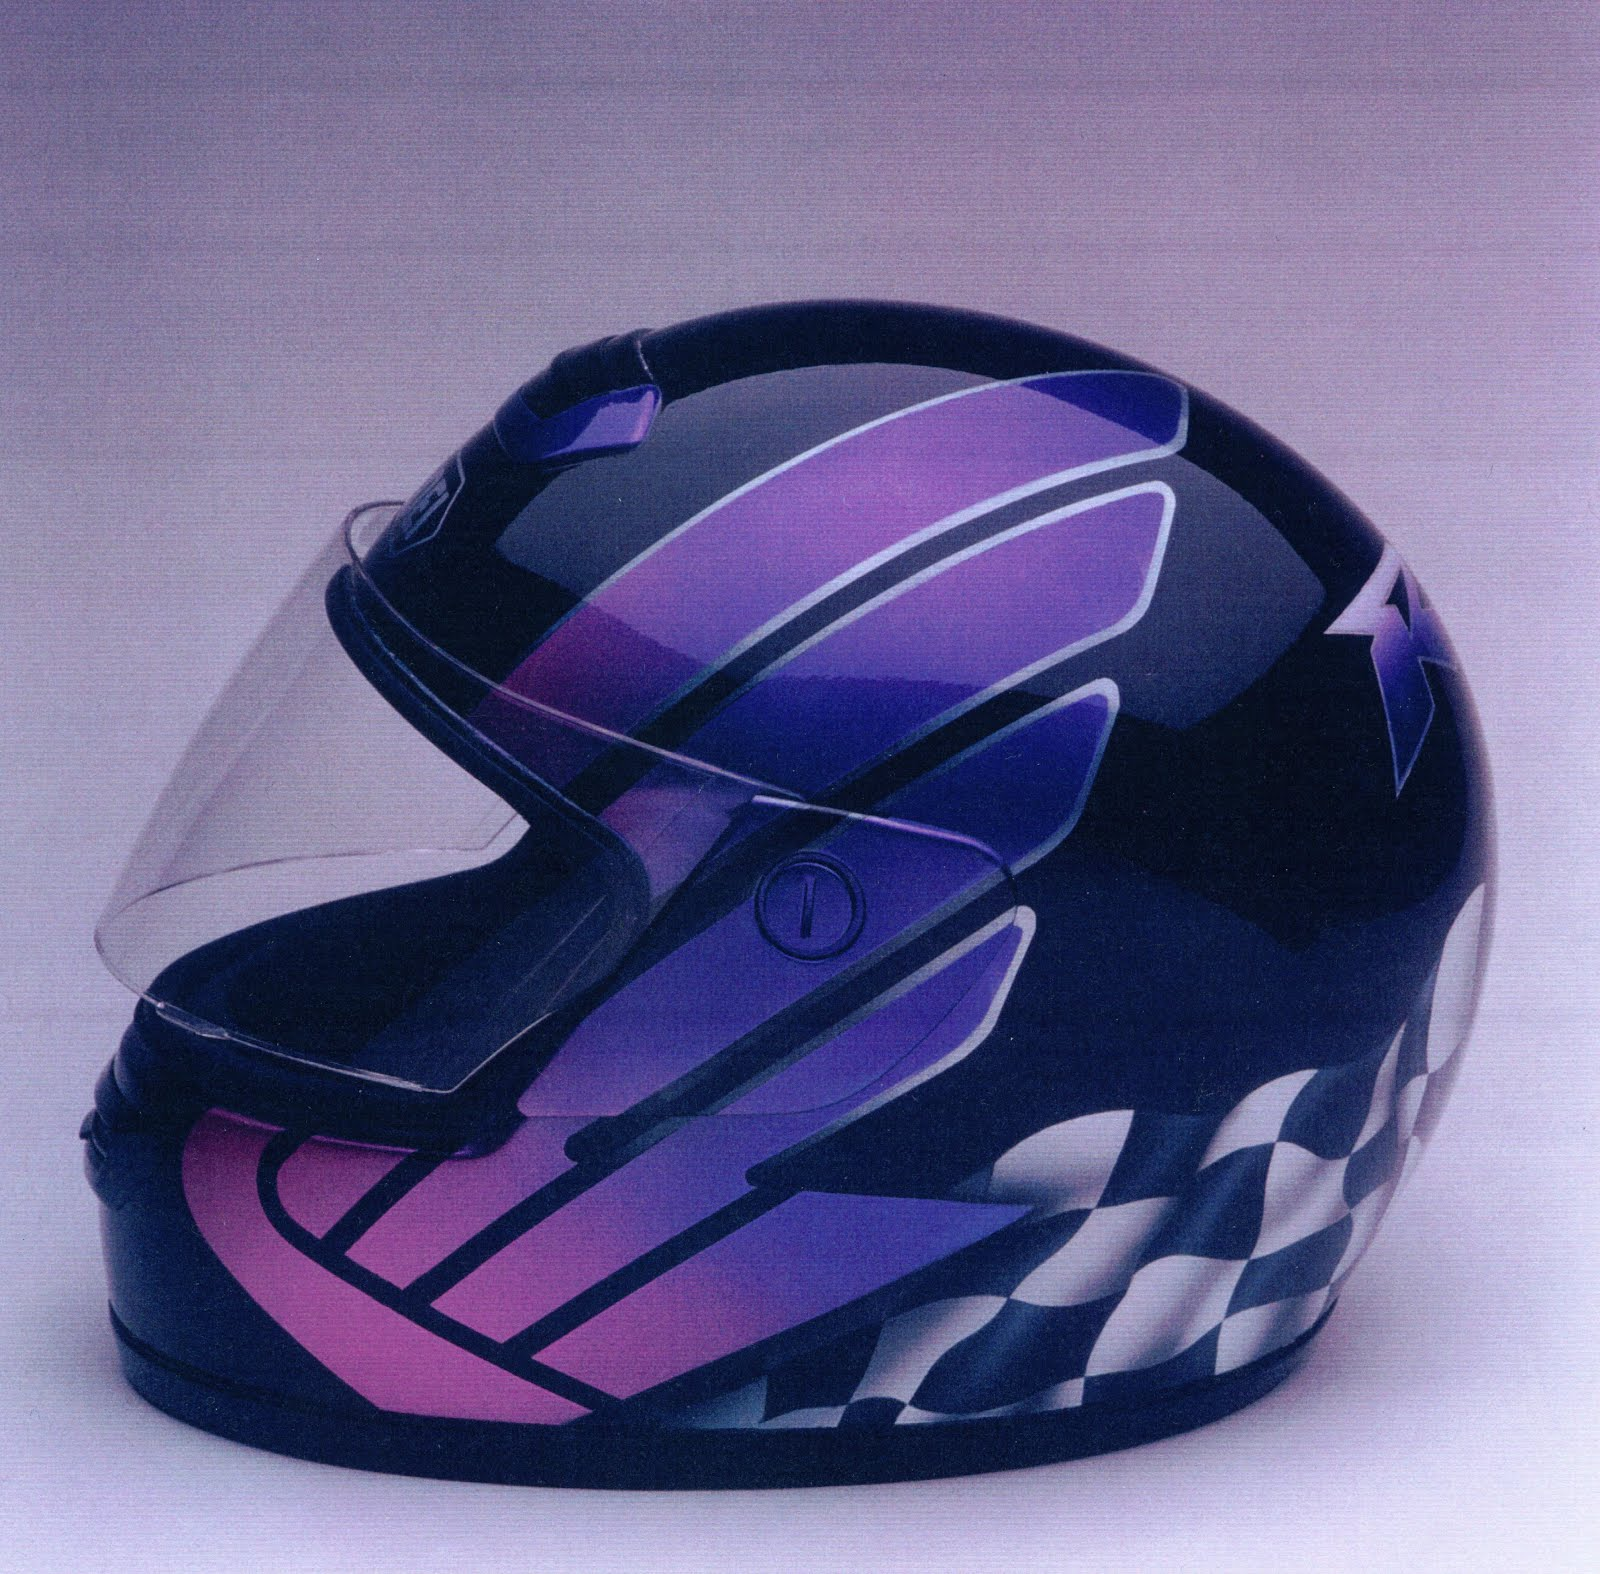 RR Helmet